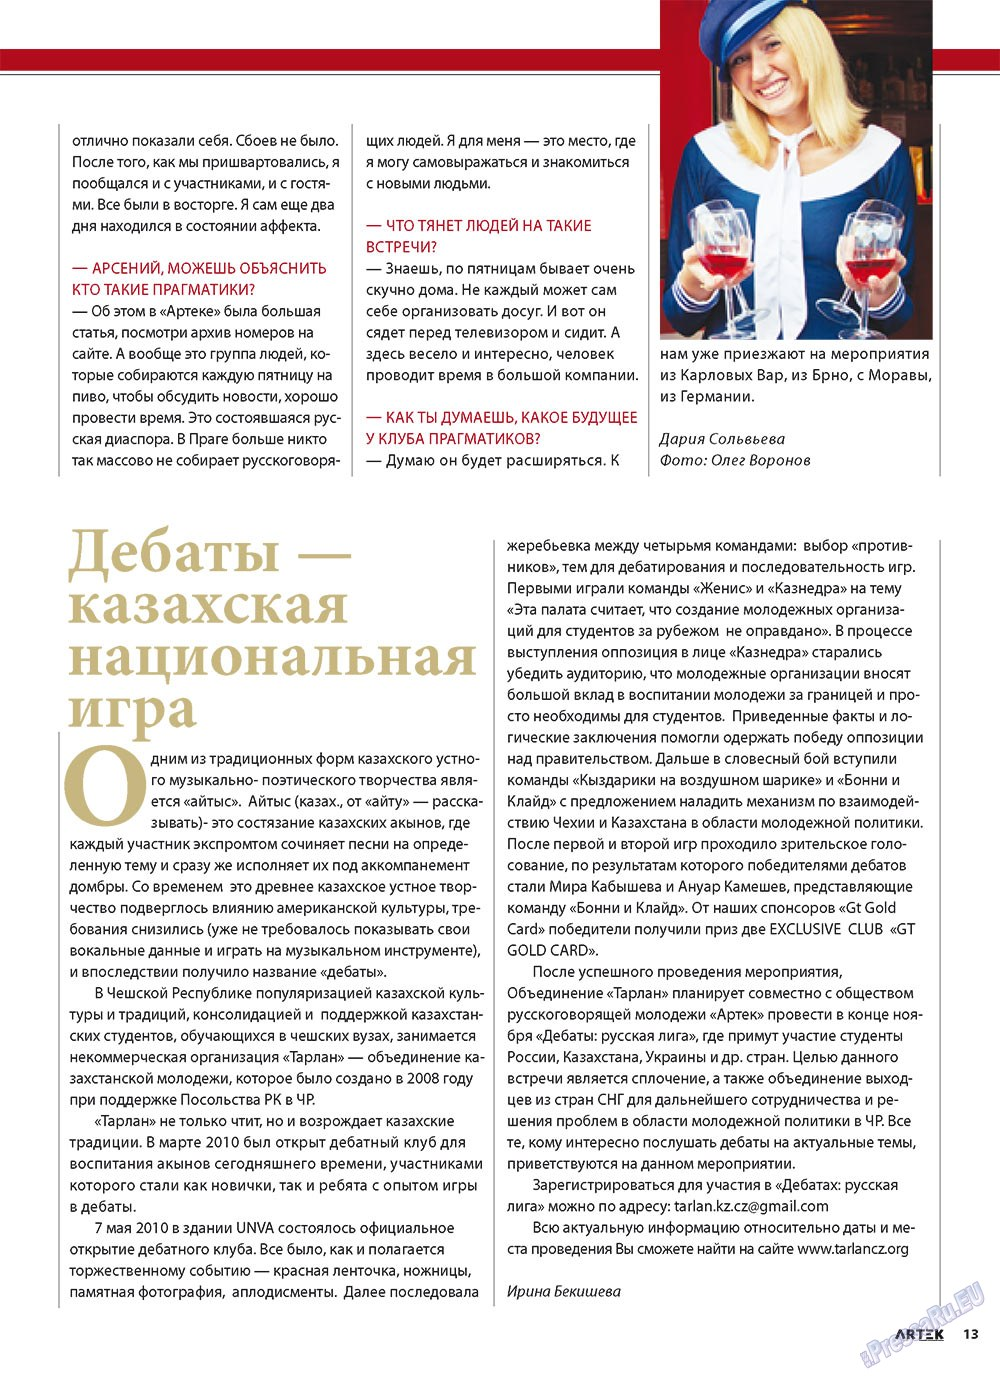 Артек (журнал). 2010 год, номер 5, стр. 15